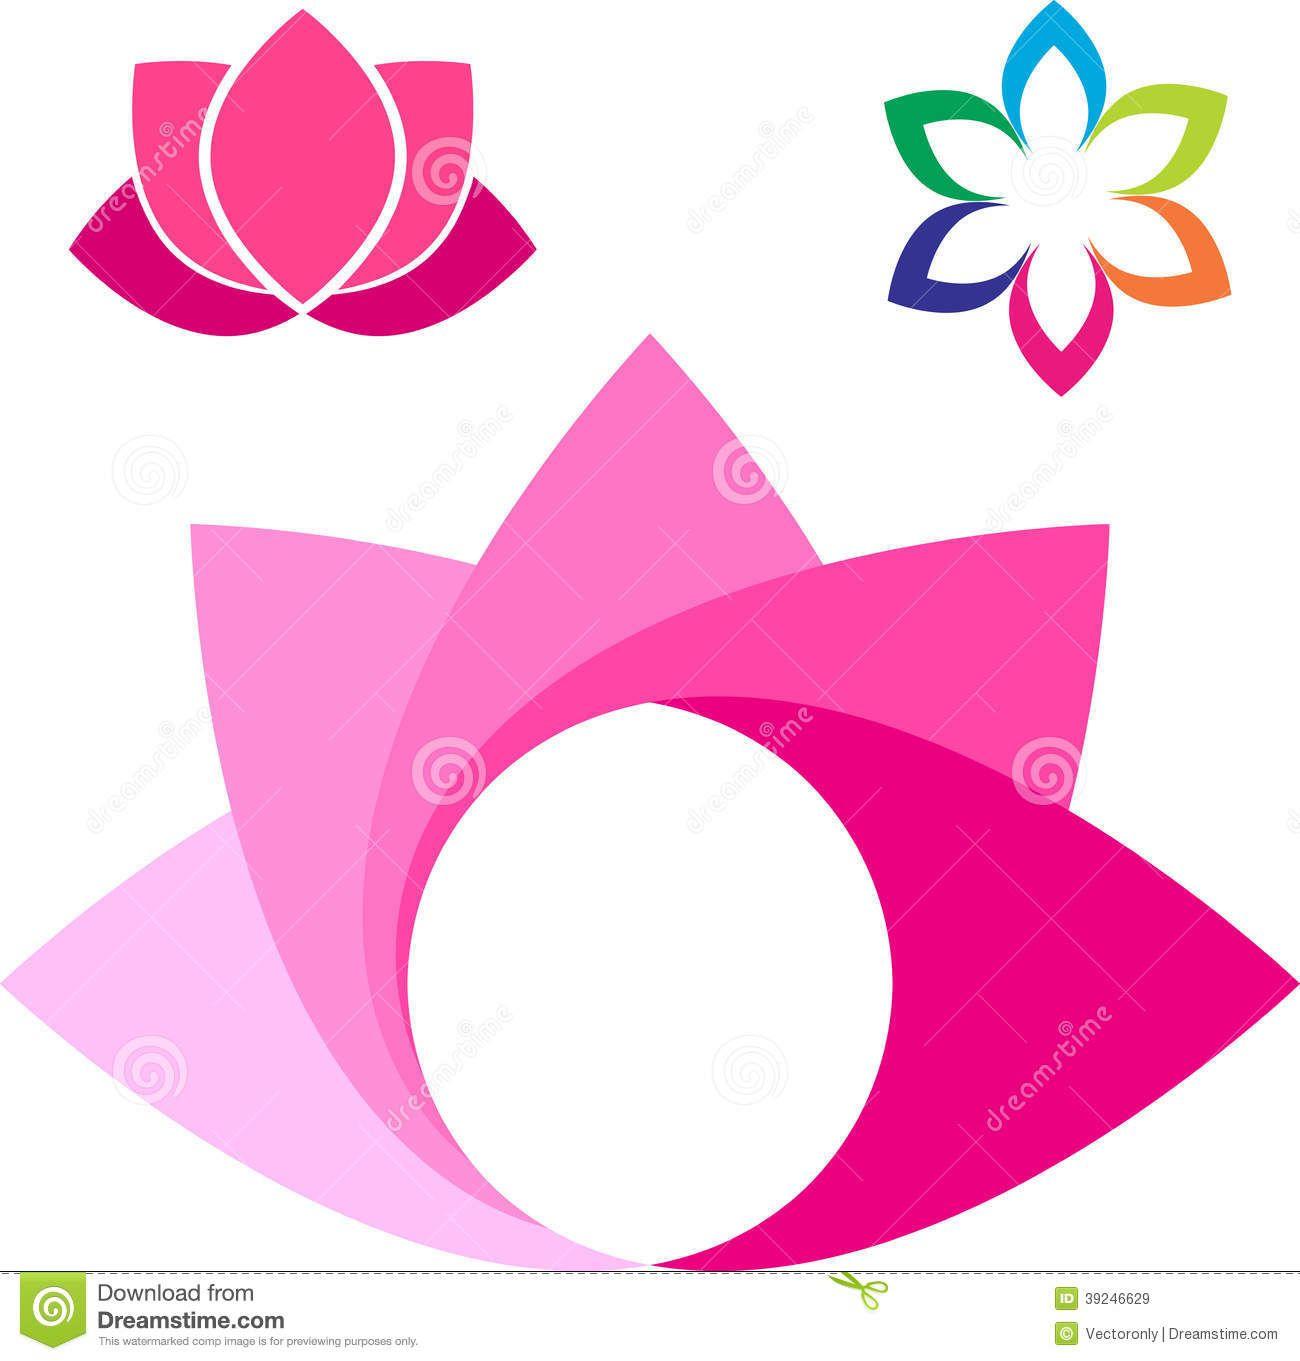 lotus logo google search unakanda website pinterest lotus rh pinterest com lotus flower logo design